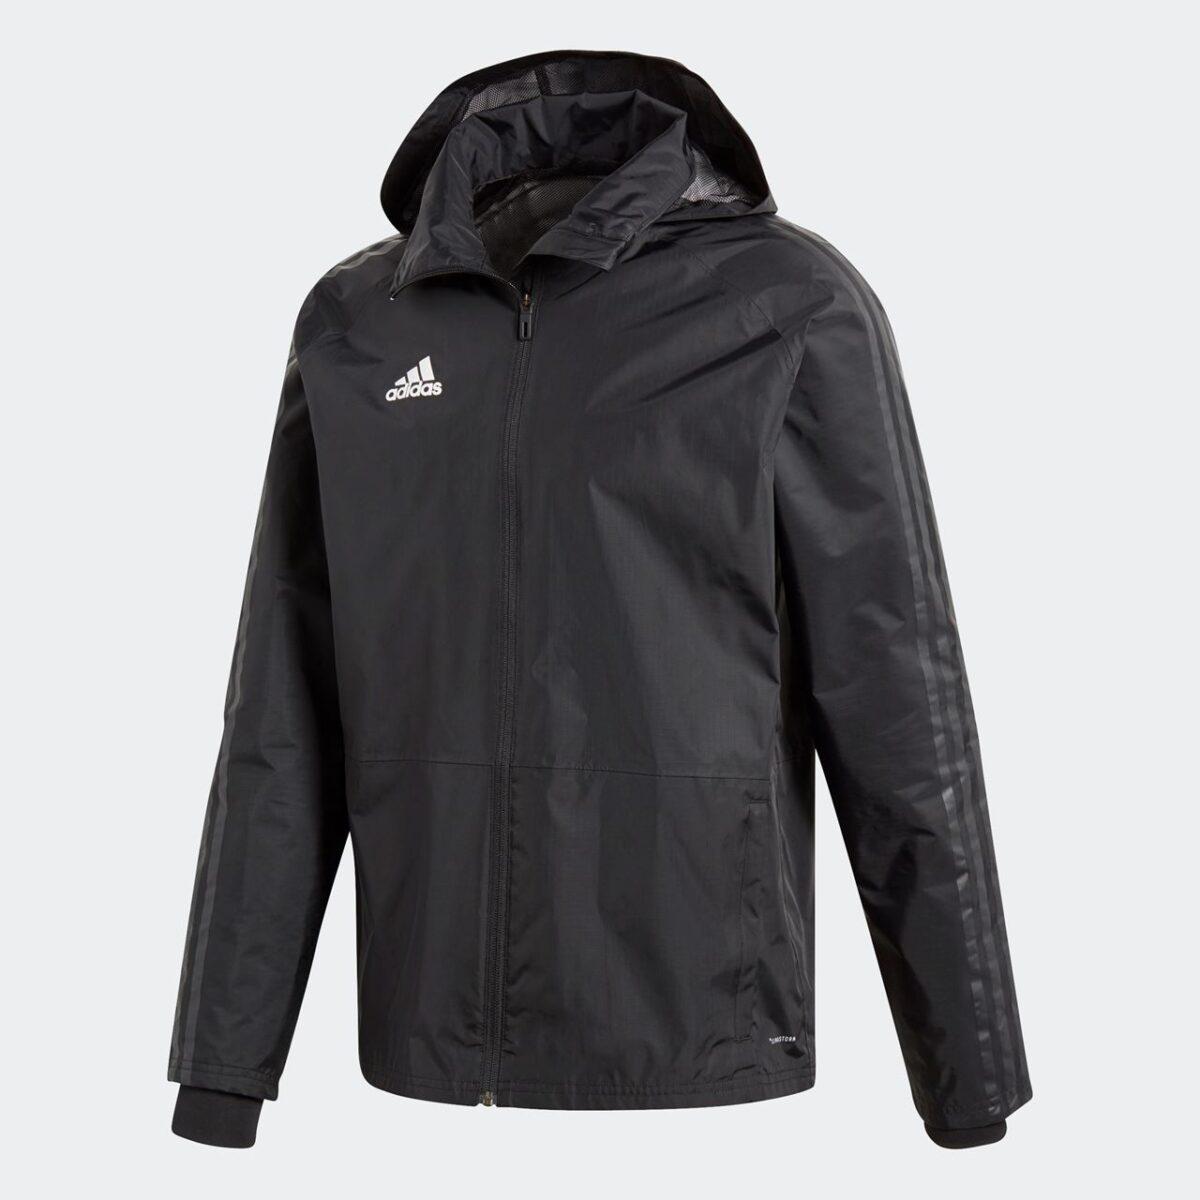 Adidas Condivo 18 Storm Jacket